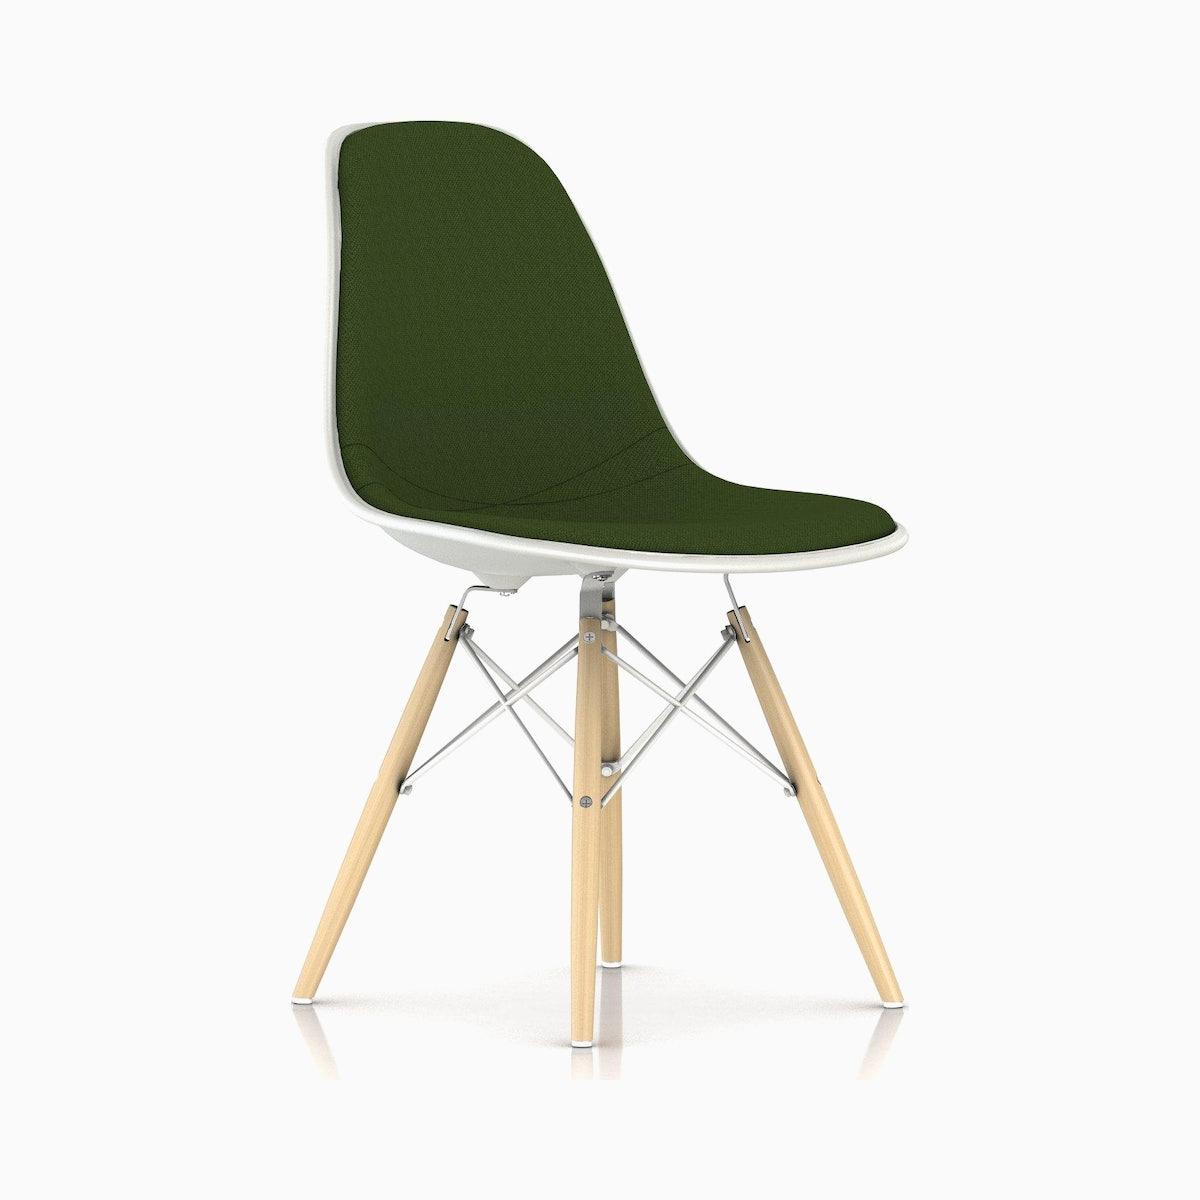 Eames Upholstered Molded Plastic Side Chair - Dowel Leg DSW.U